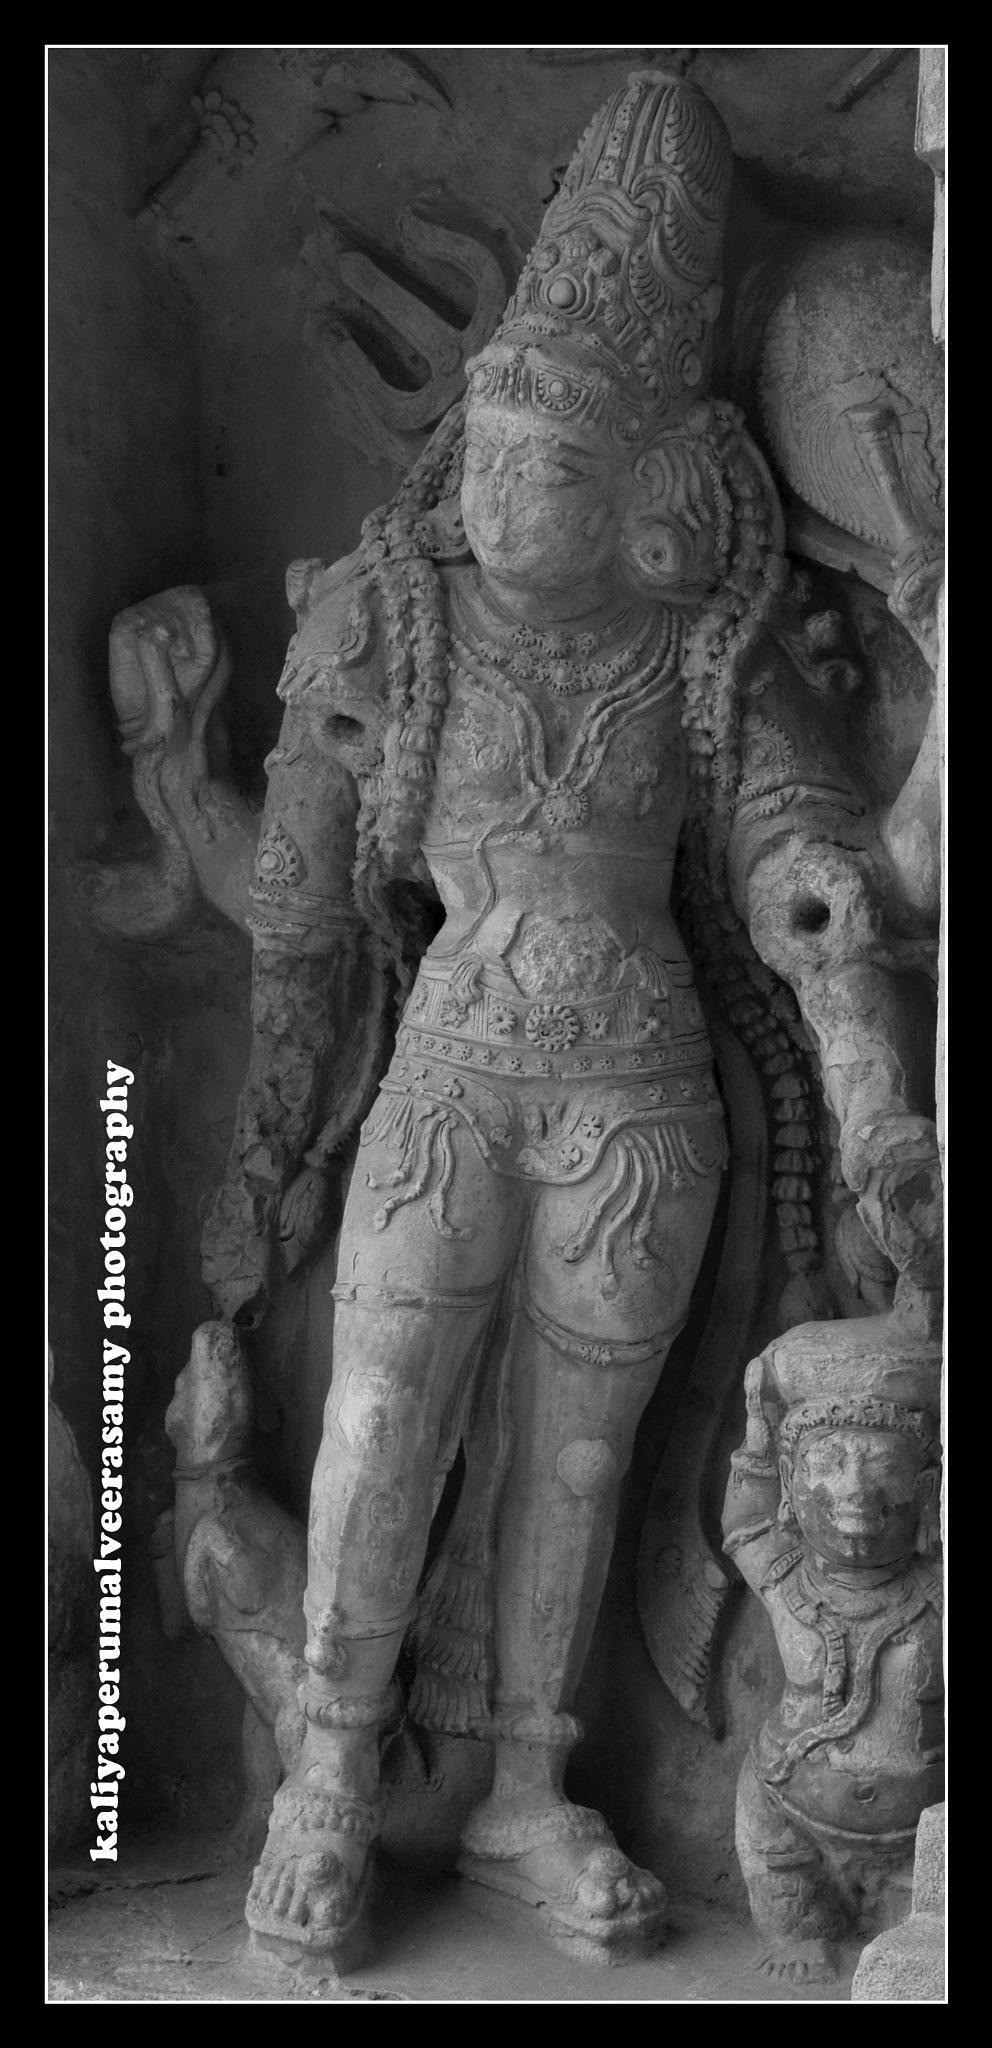 Untitled by Kaliyaperumalveerasamy